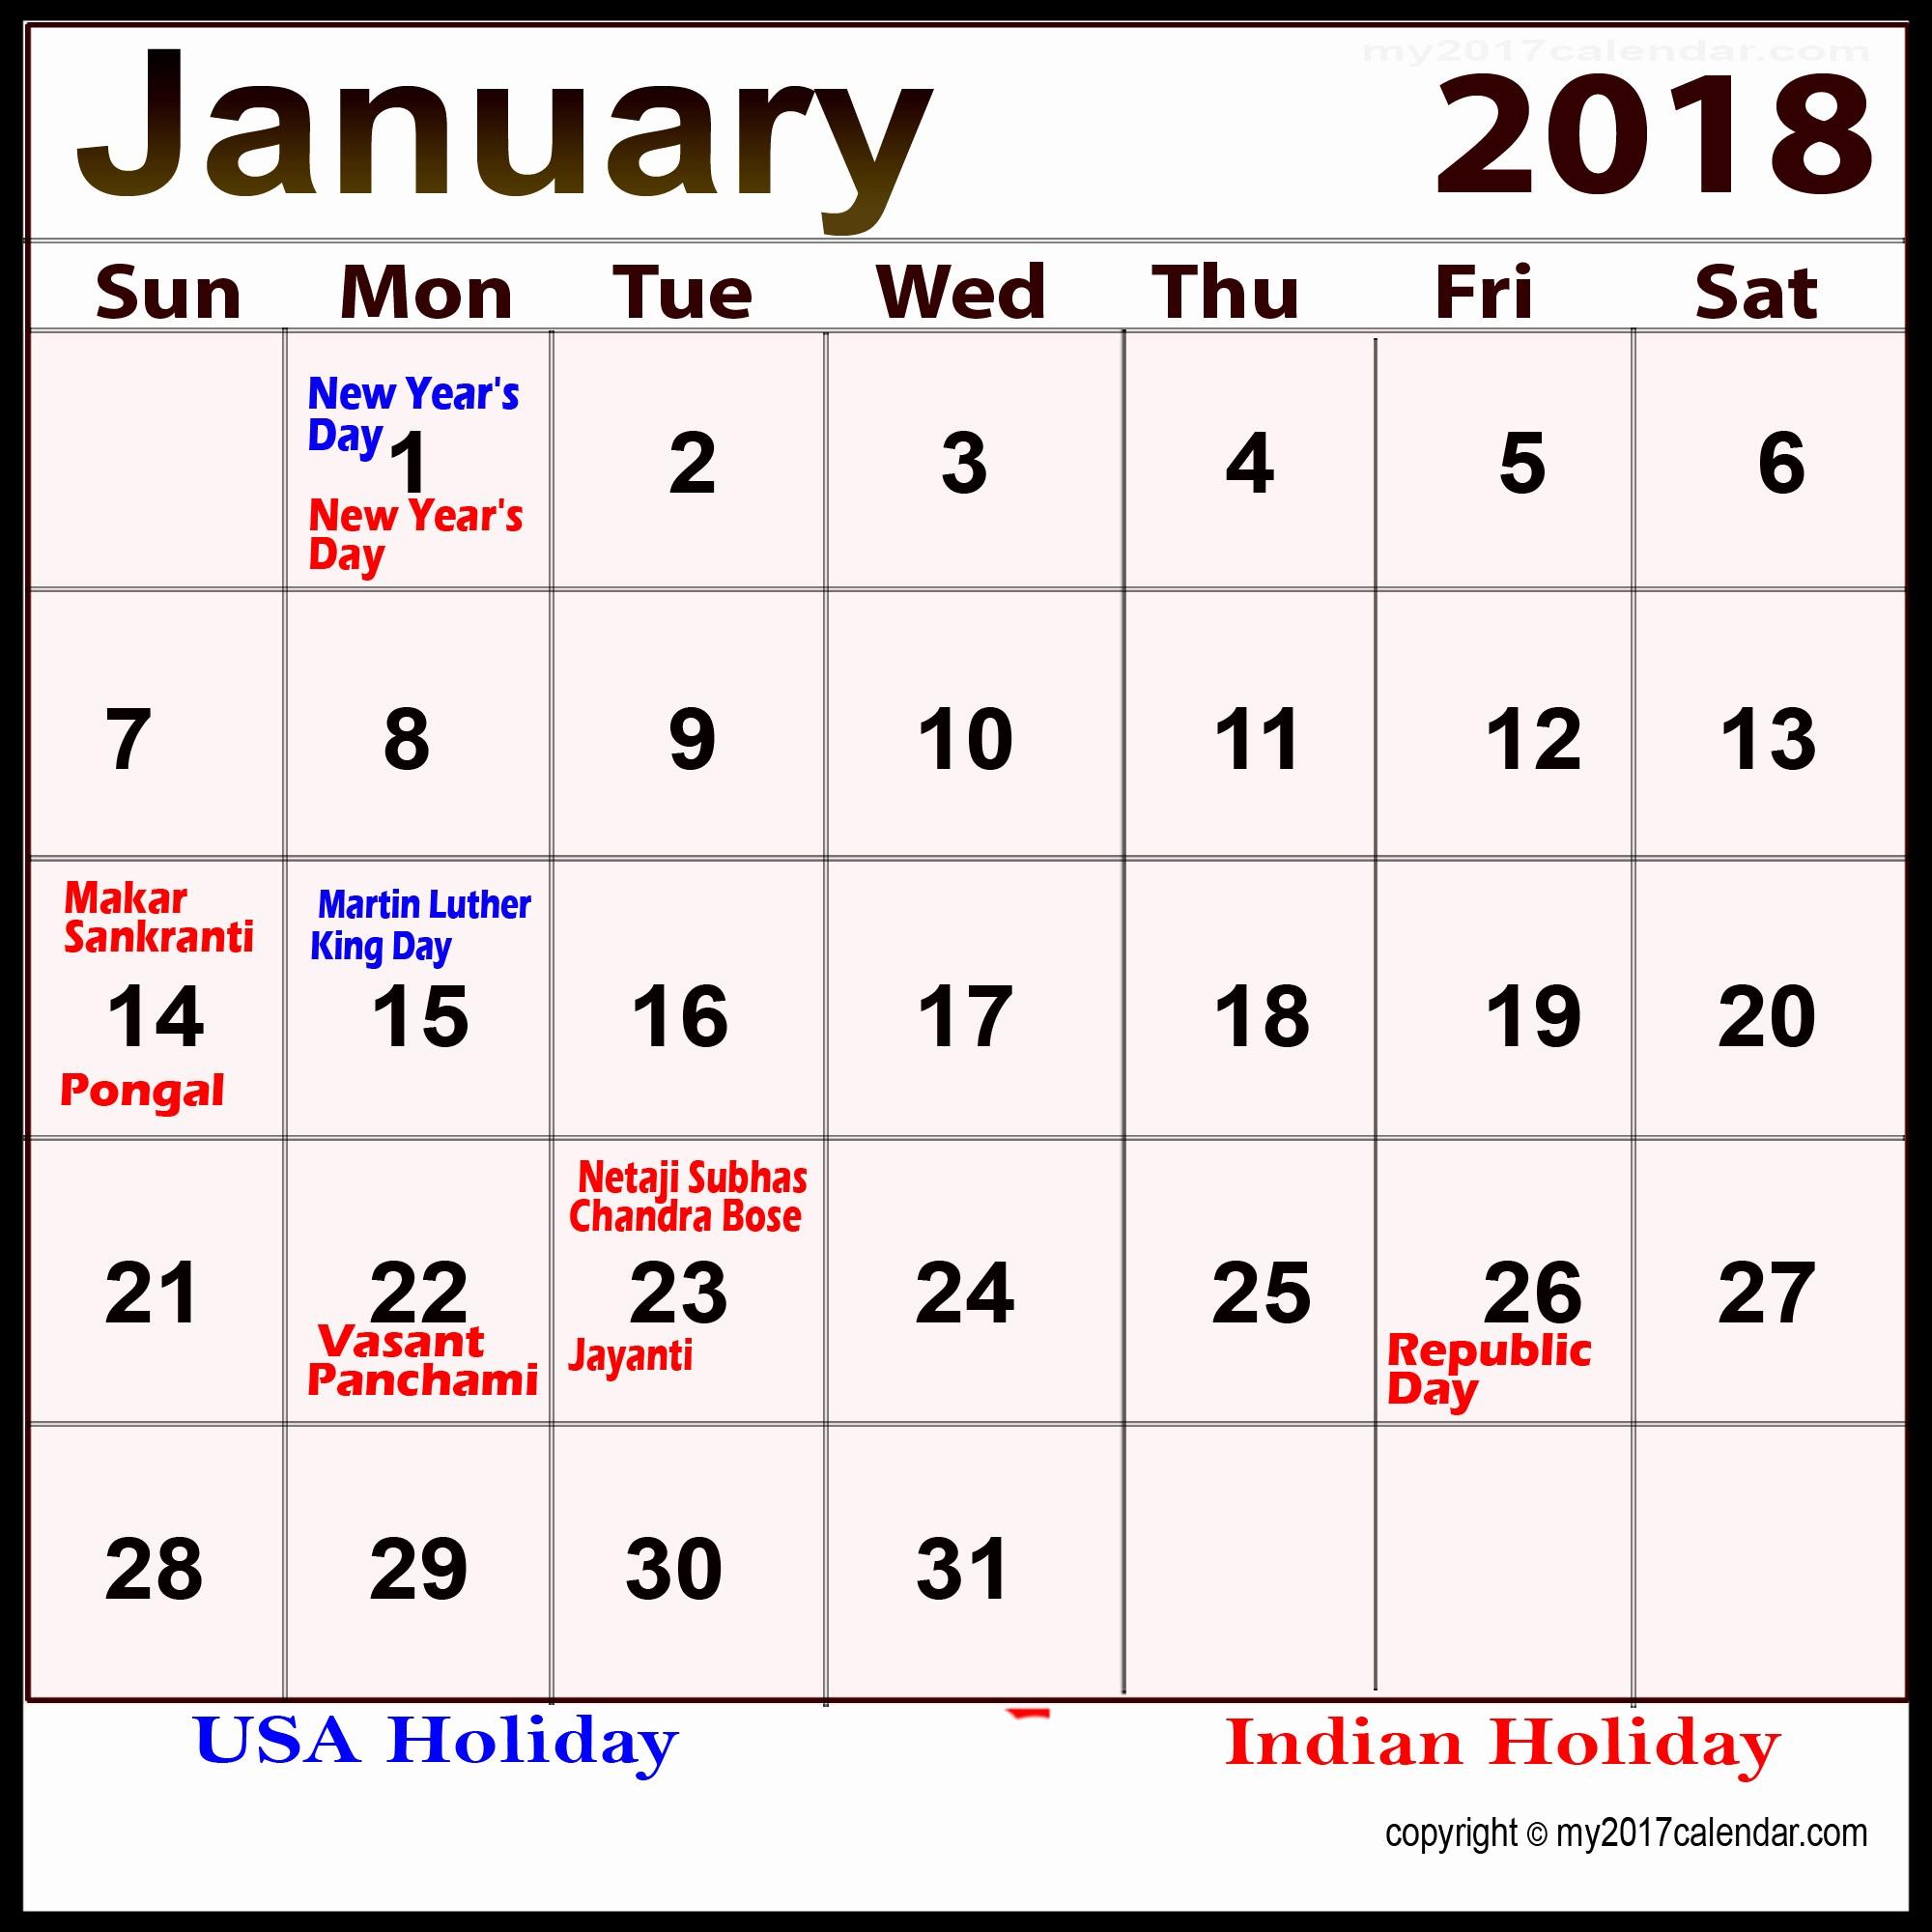 Calendar 2018 Printable with Holidays Inspirational January 2018 Calendar with Holidays Printable